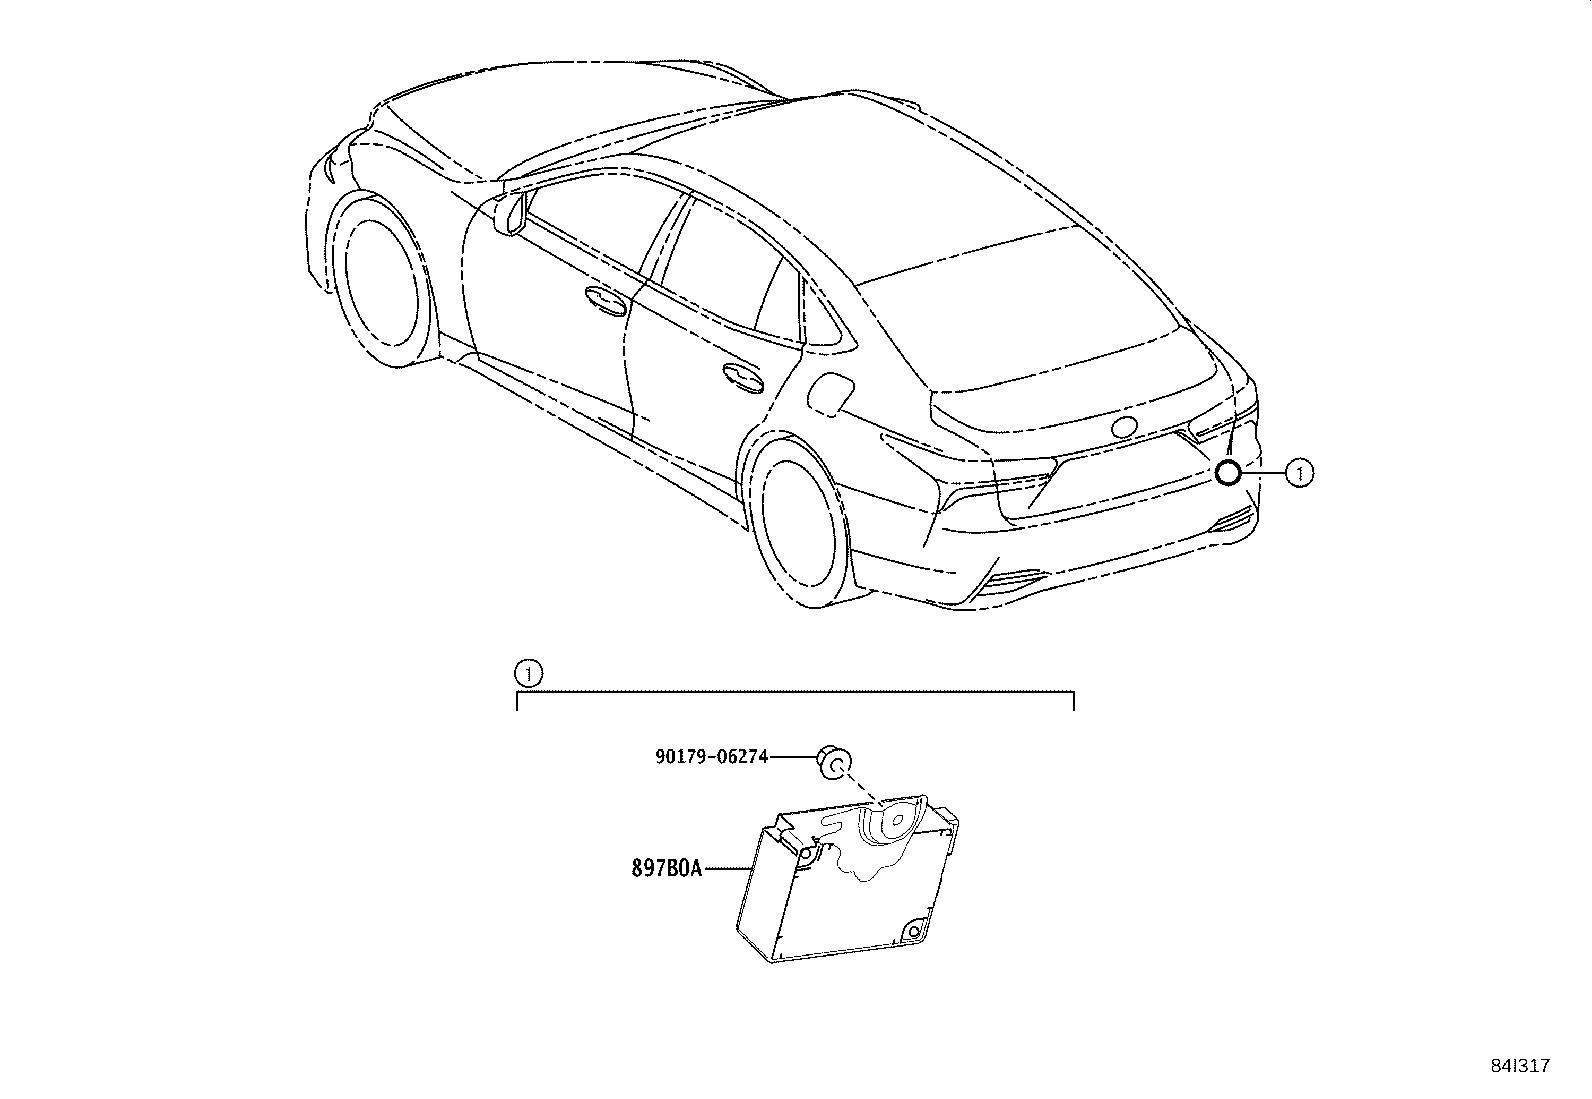 Diagram Lexus Ls 500 Wiring Diagram Full Version Hd Quality Wiring Diagram Xschematic43 Mykidz It